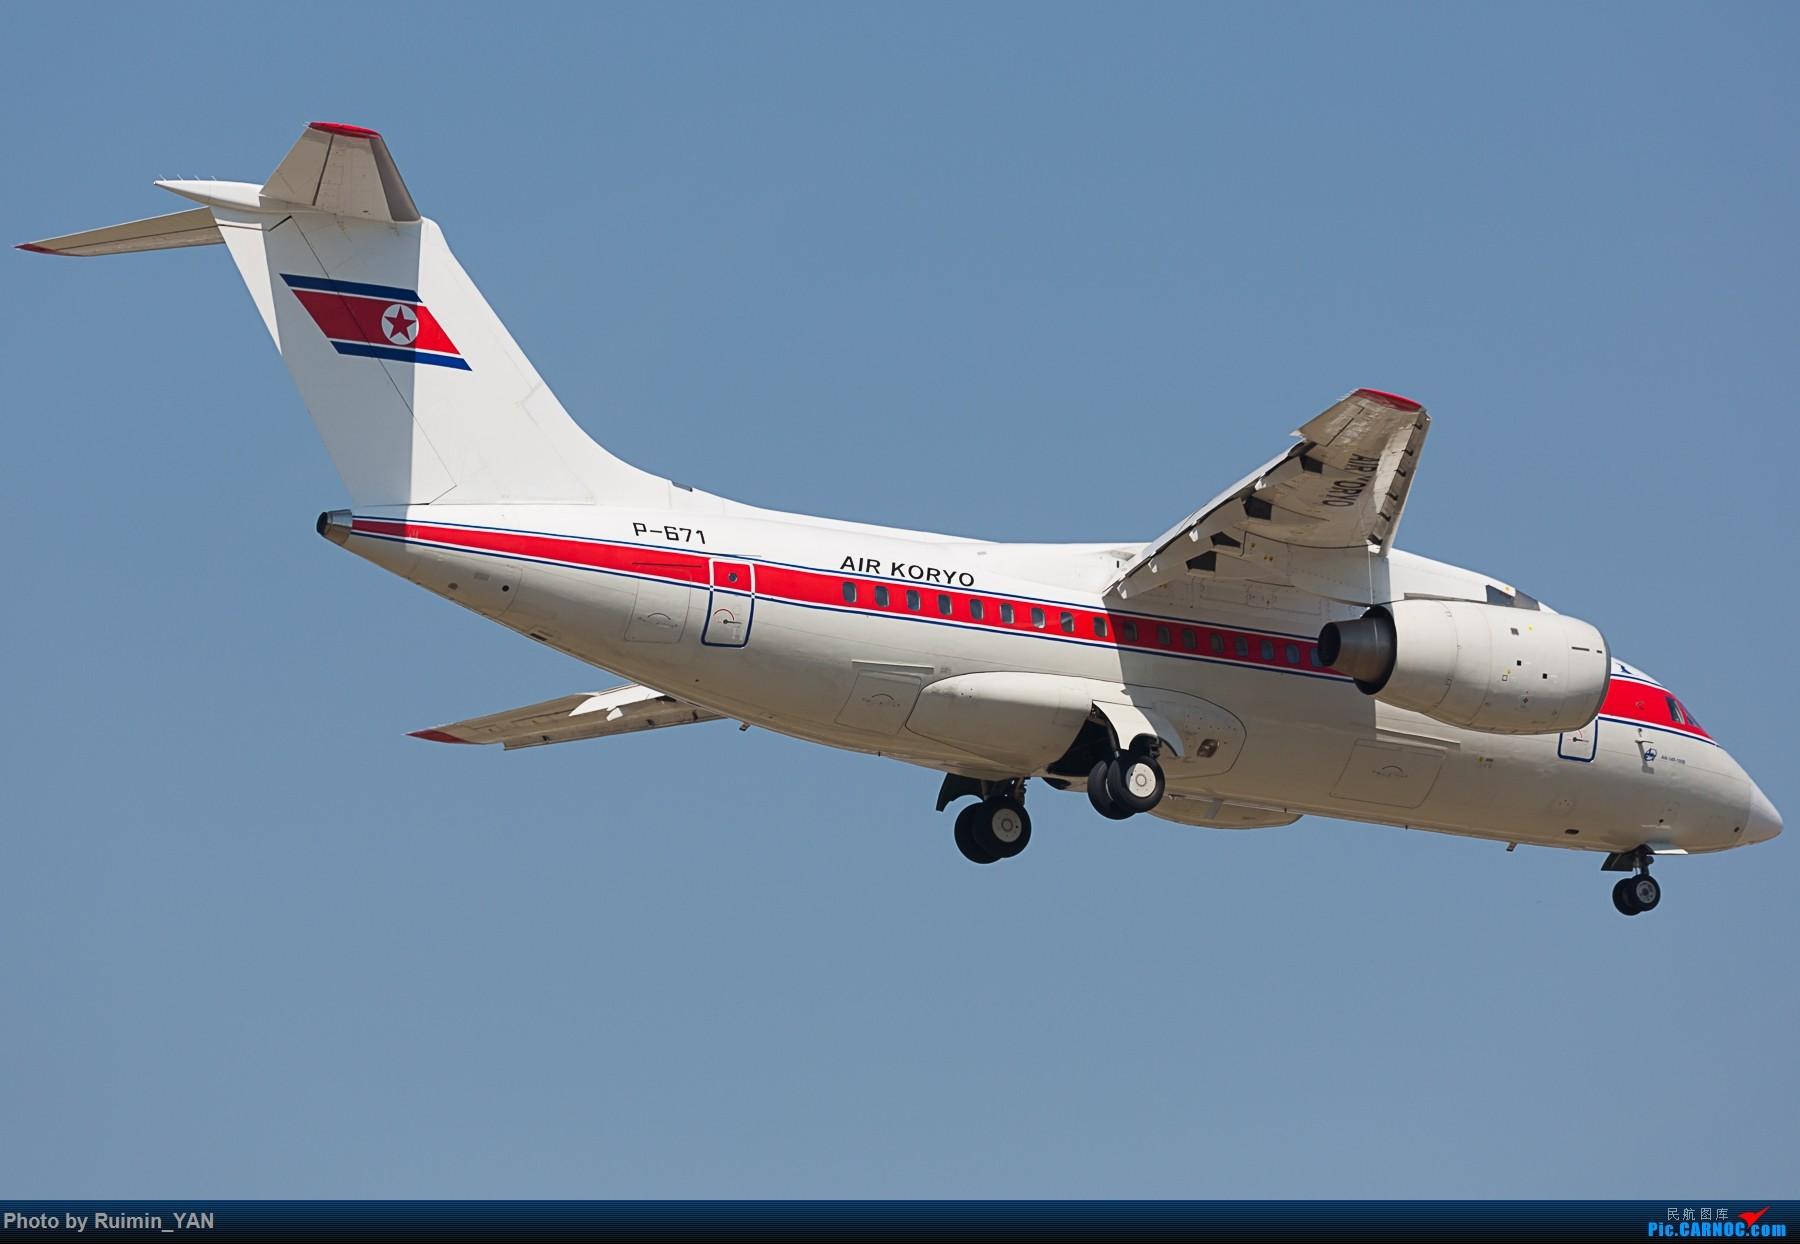 Re:[原创]【PEK】朝鲜高丽航空(JS, Air Koryo) P-671 安东诺夫 Antonov AN-148 ANTONOV AN-148 P-671 中国北京首都国际机场